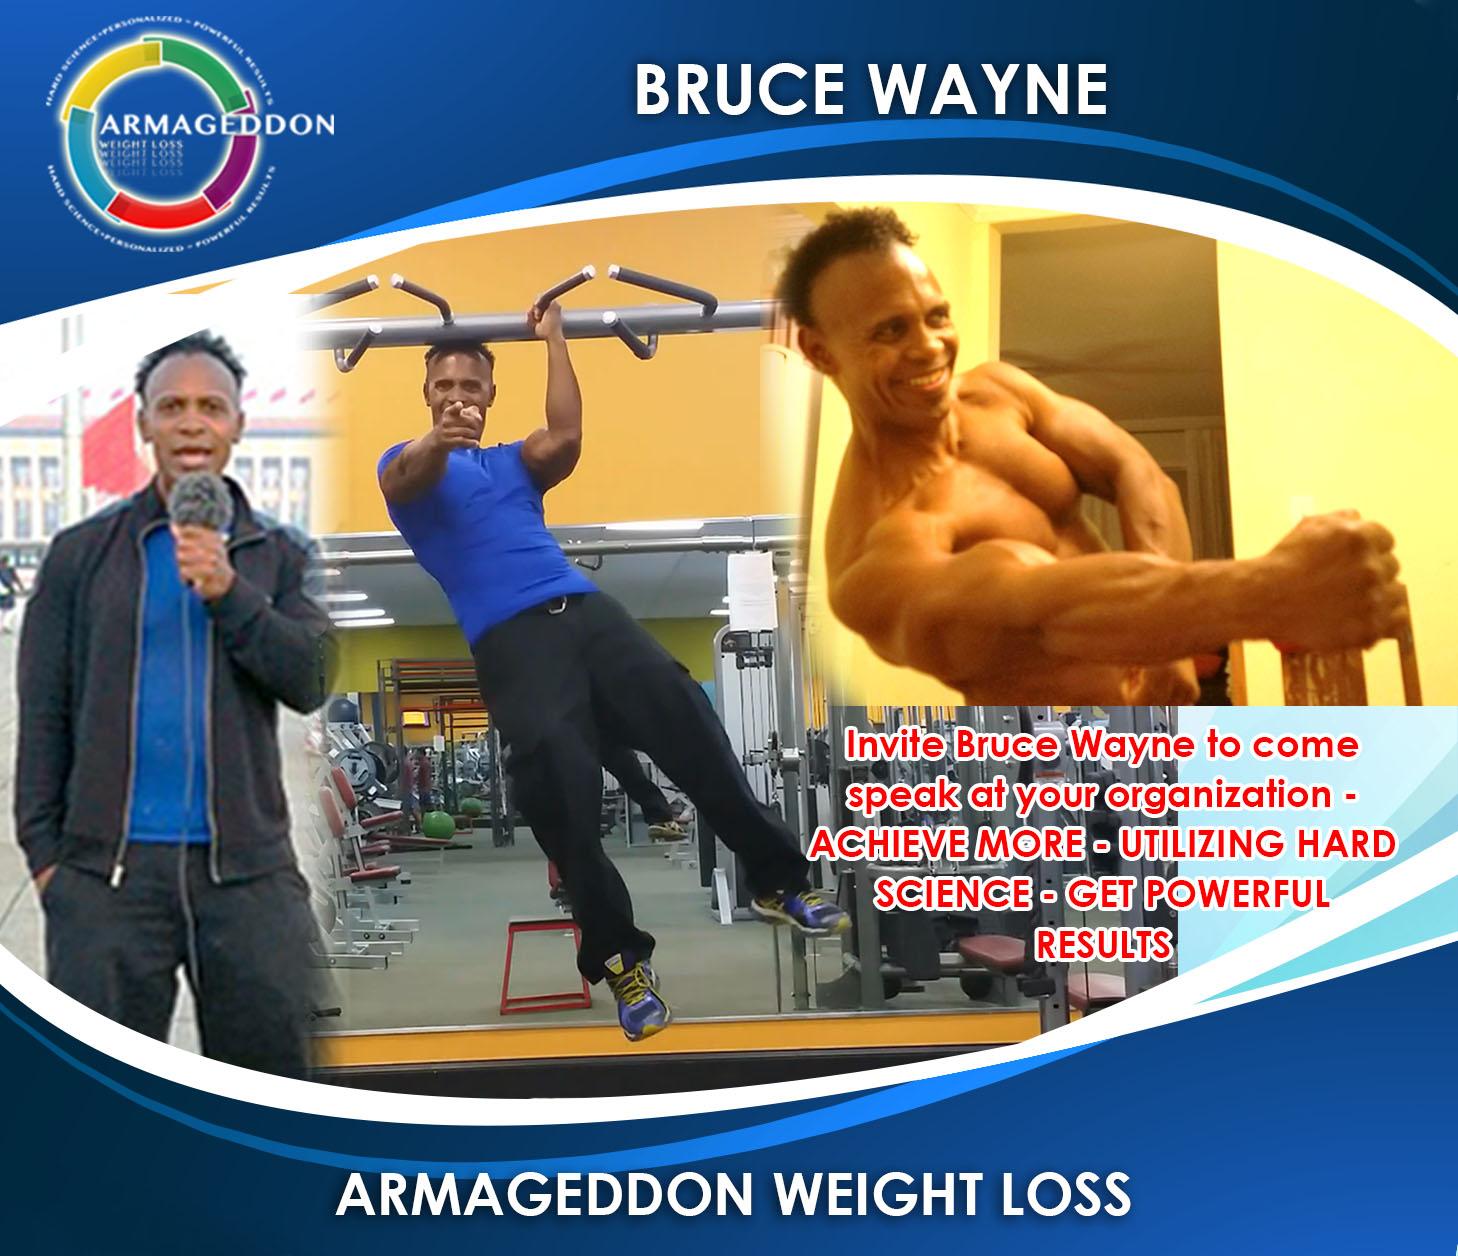 Bruce Wayne - Armageddon Weight Loss - Motivational Speaker, Fitness, Nutrition, Weight Loss, Radio Show host